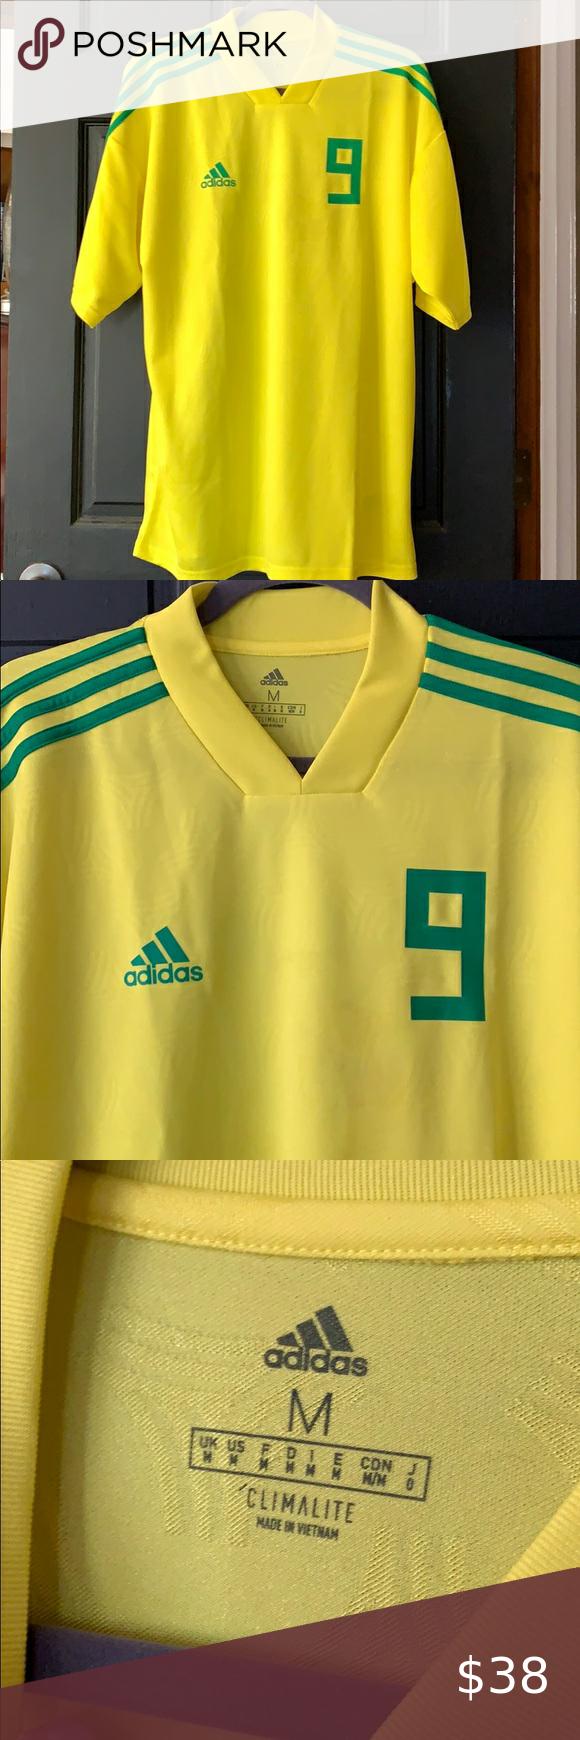 Adidas Brazil 9 soccer jersey medium | Soccer jersey, Adidas ...